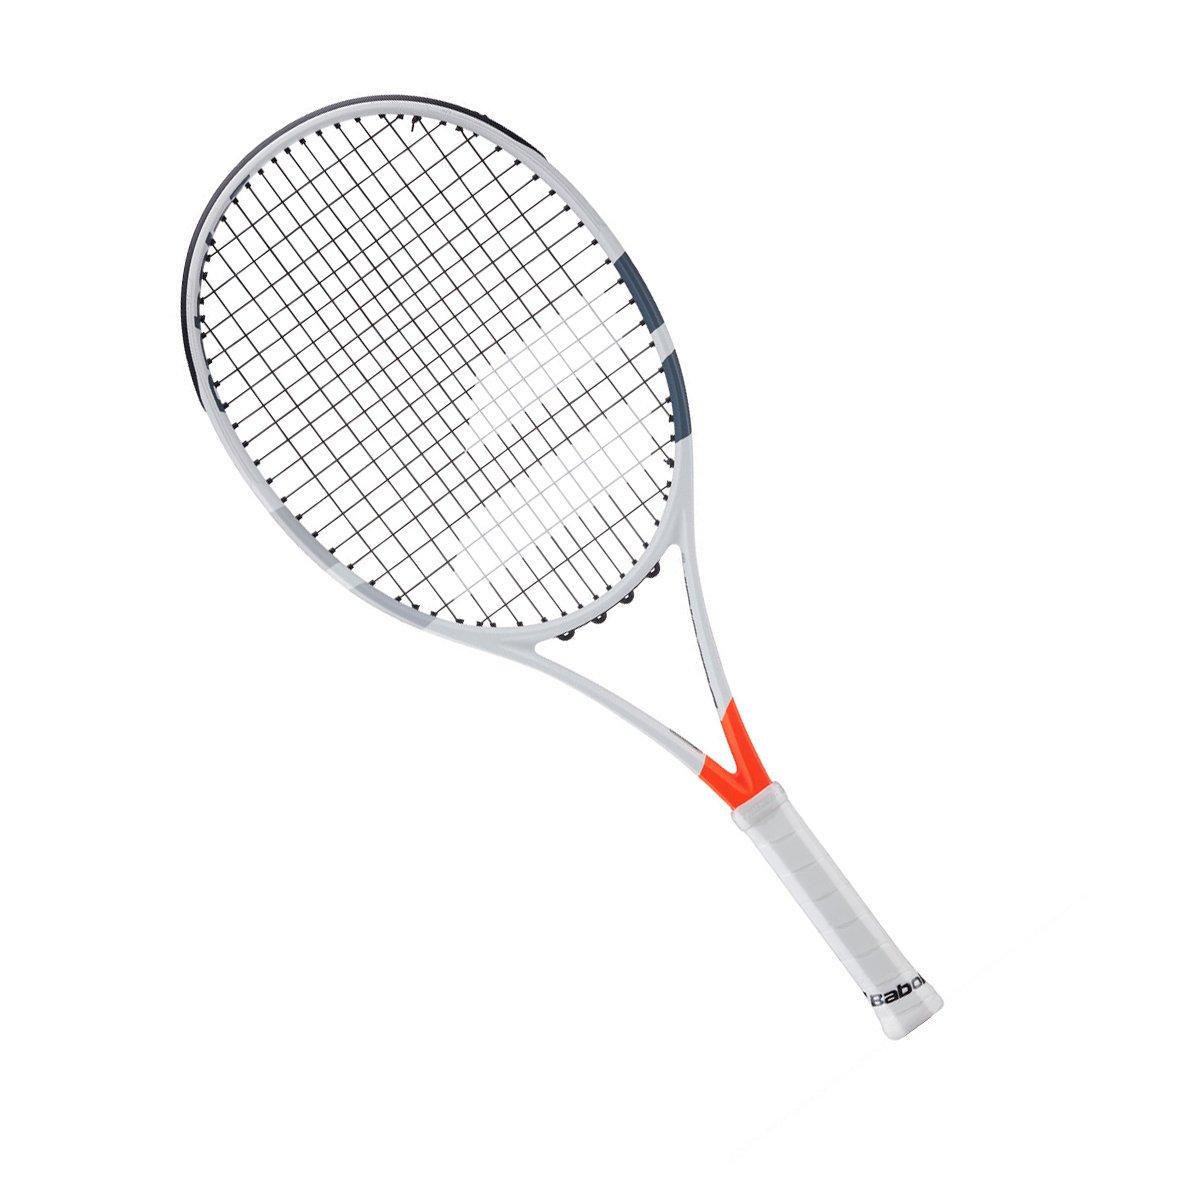 90e415e49 Raquete de Tênis Infantil Pure Strike 26 - Babolat